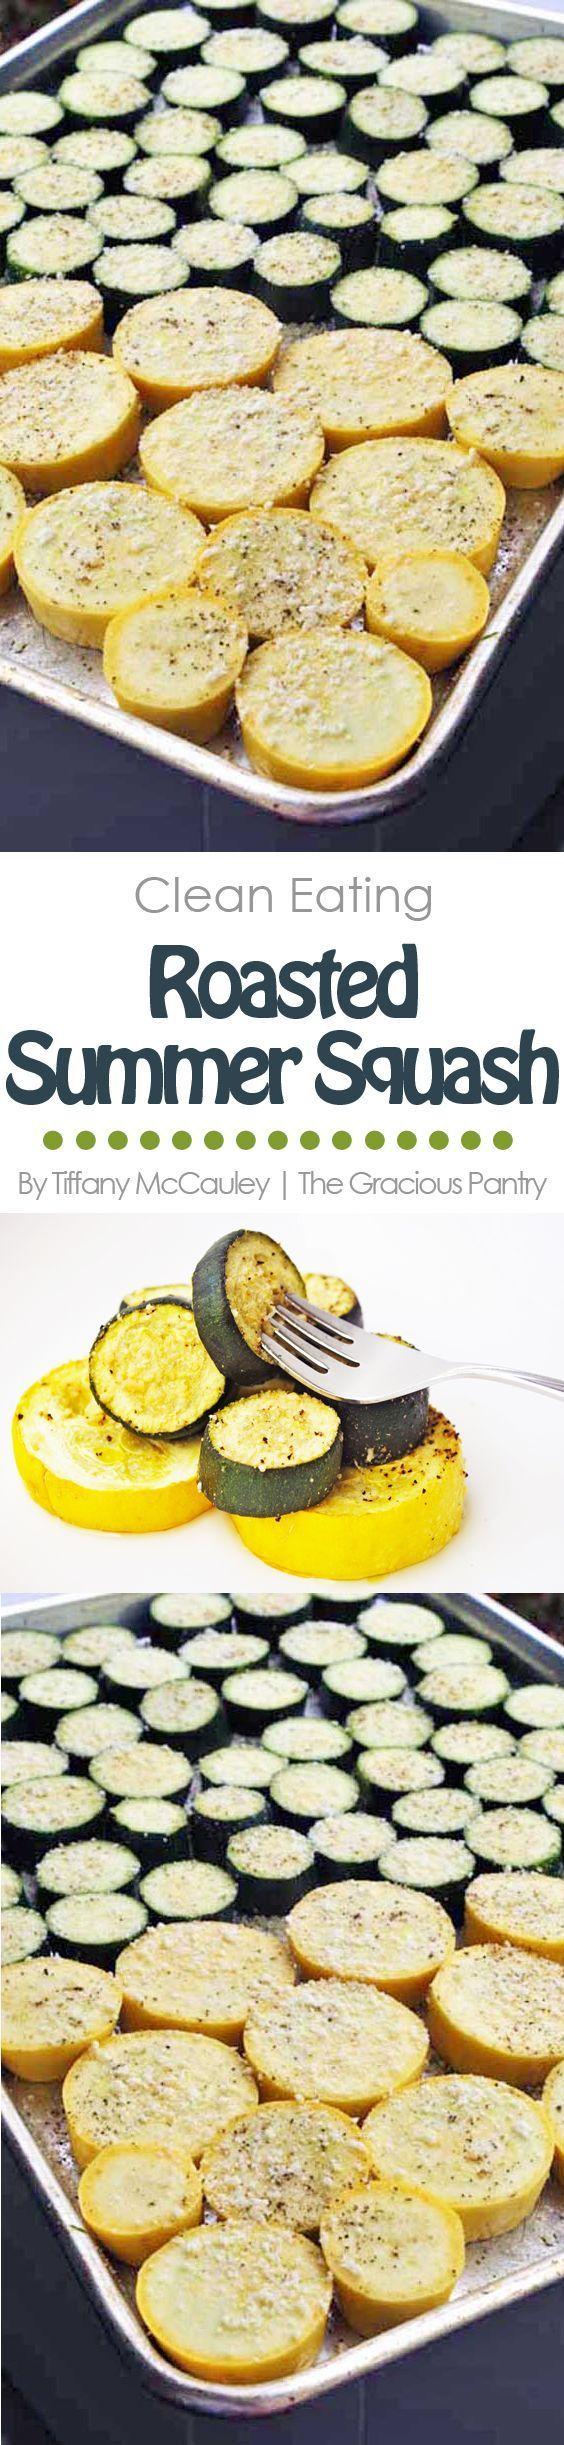 Roasted Summer Squash Recipe Food recipes, Summer